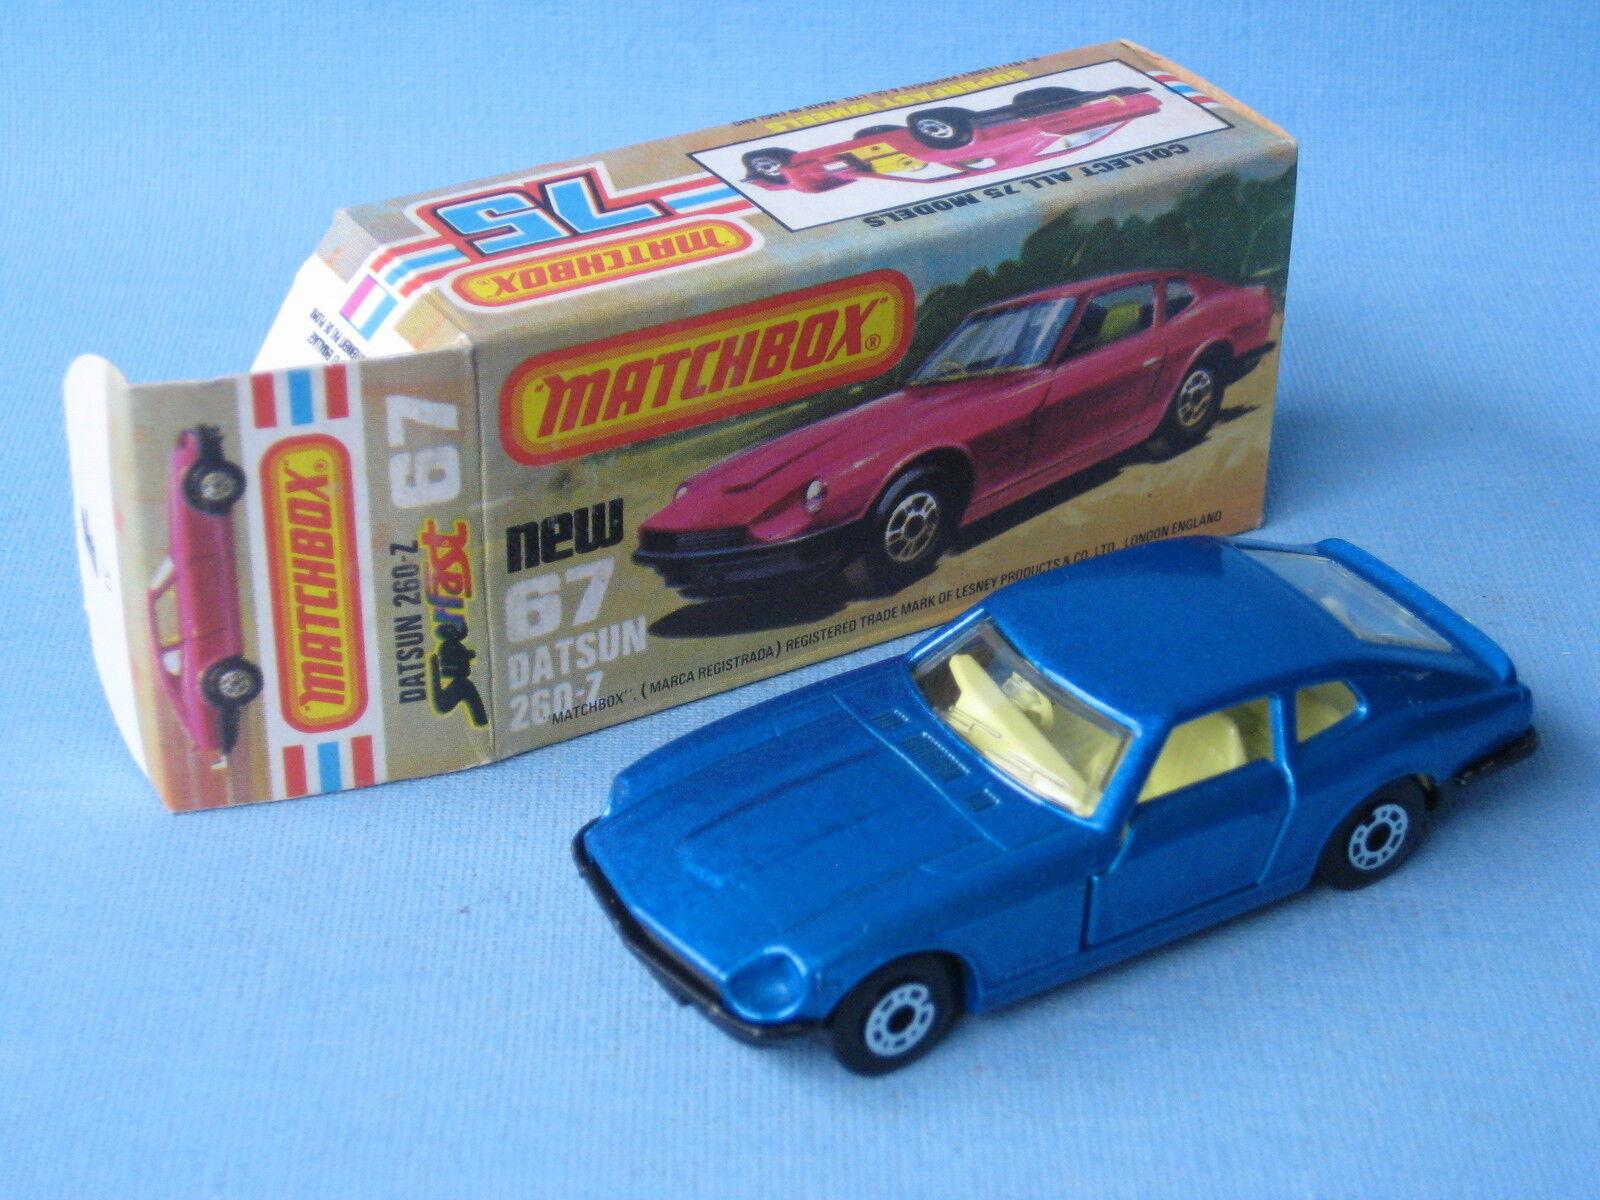 Lesney Matchbox Superfast 67 Datsun 260Z bluee Body Boxed England Toy Model Car